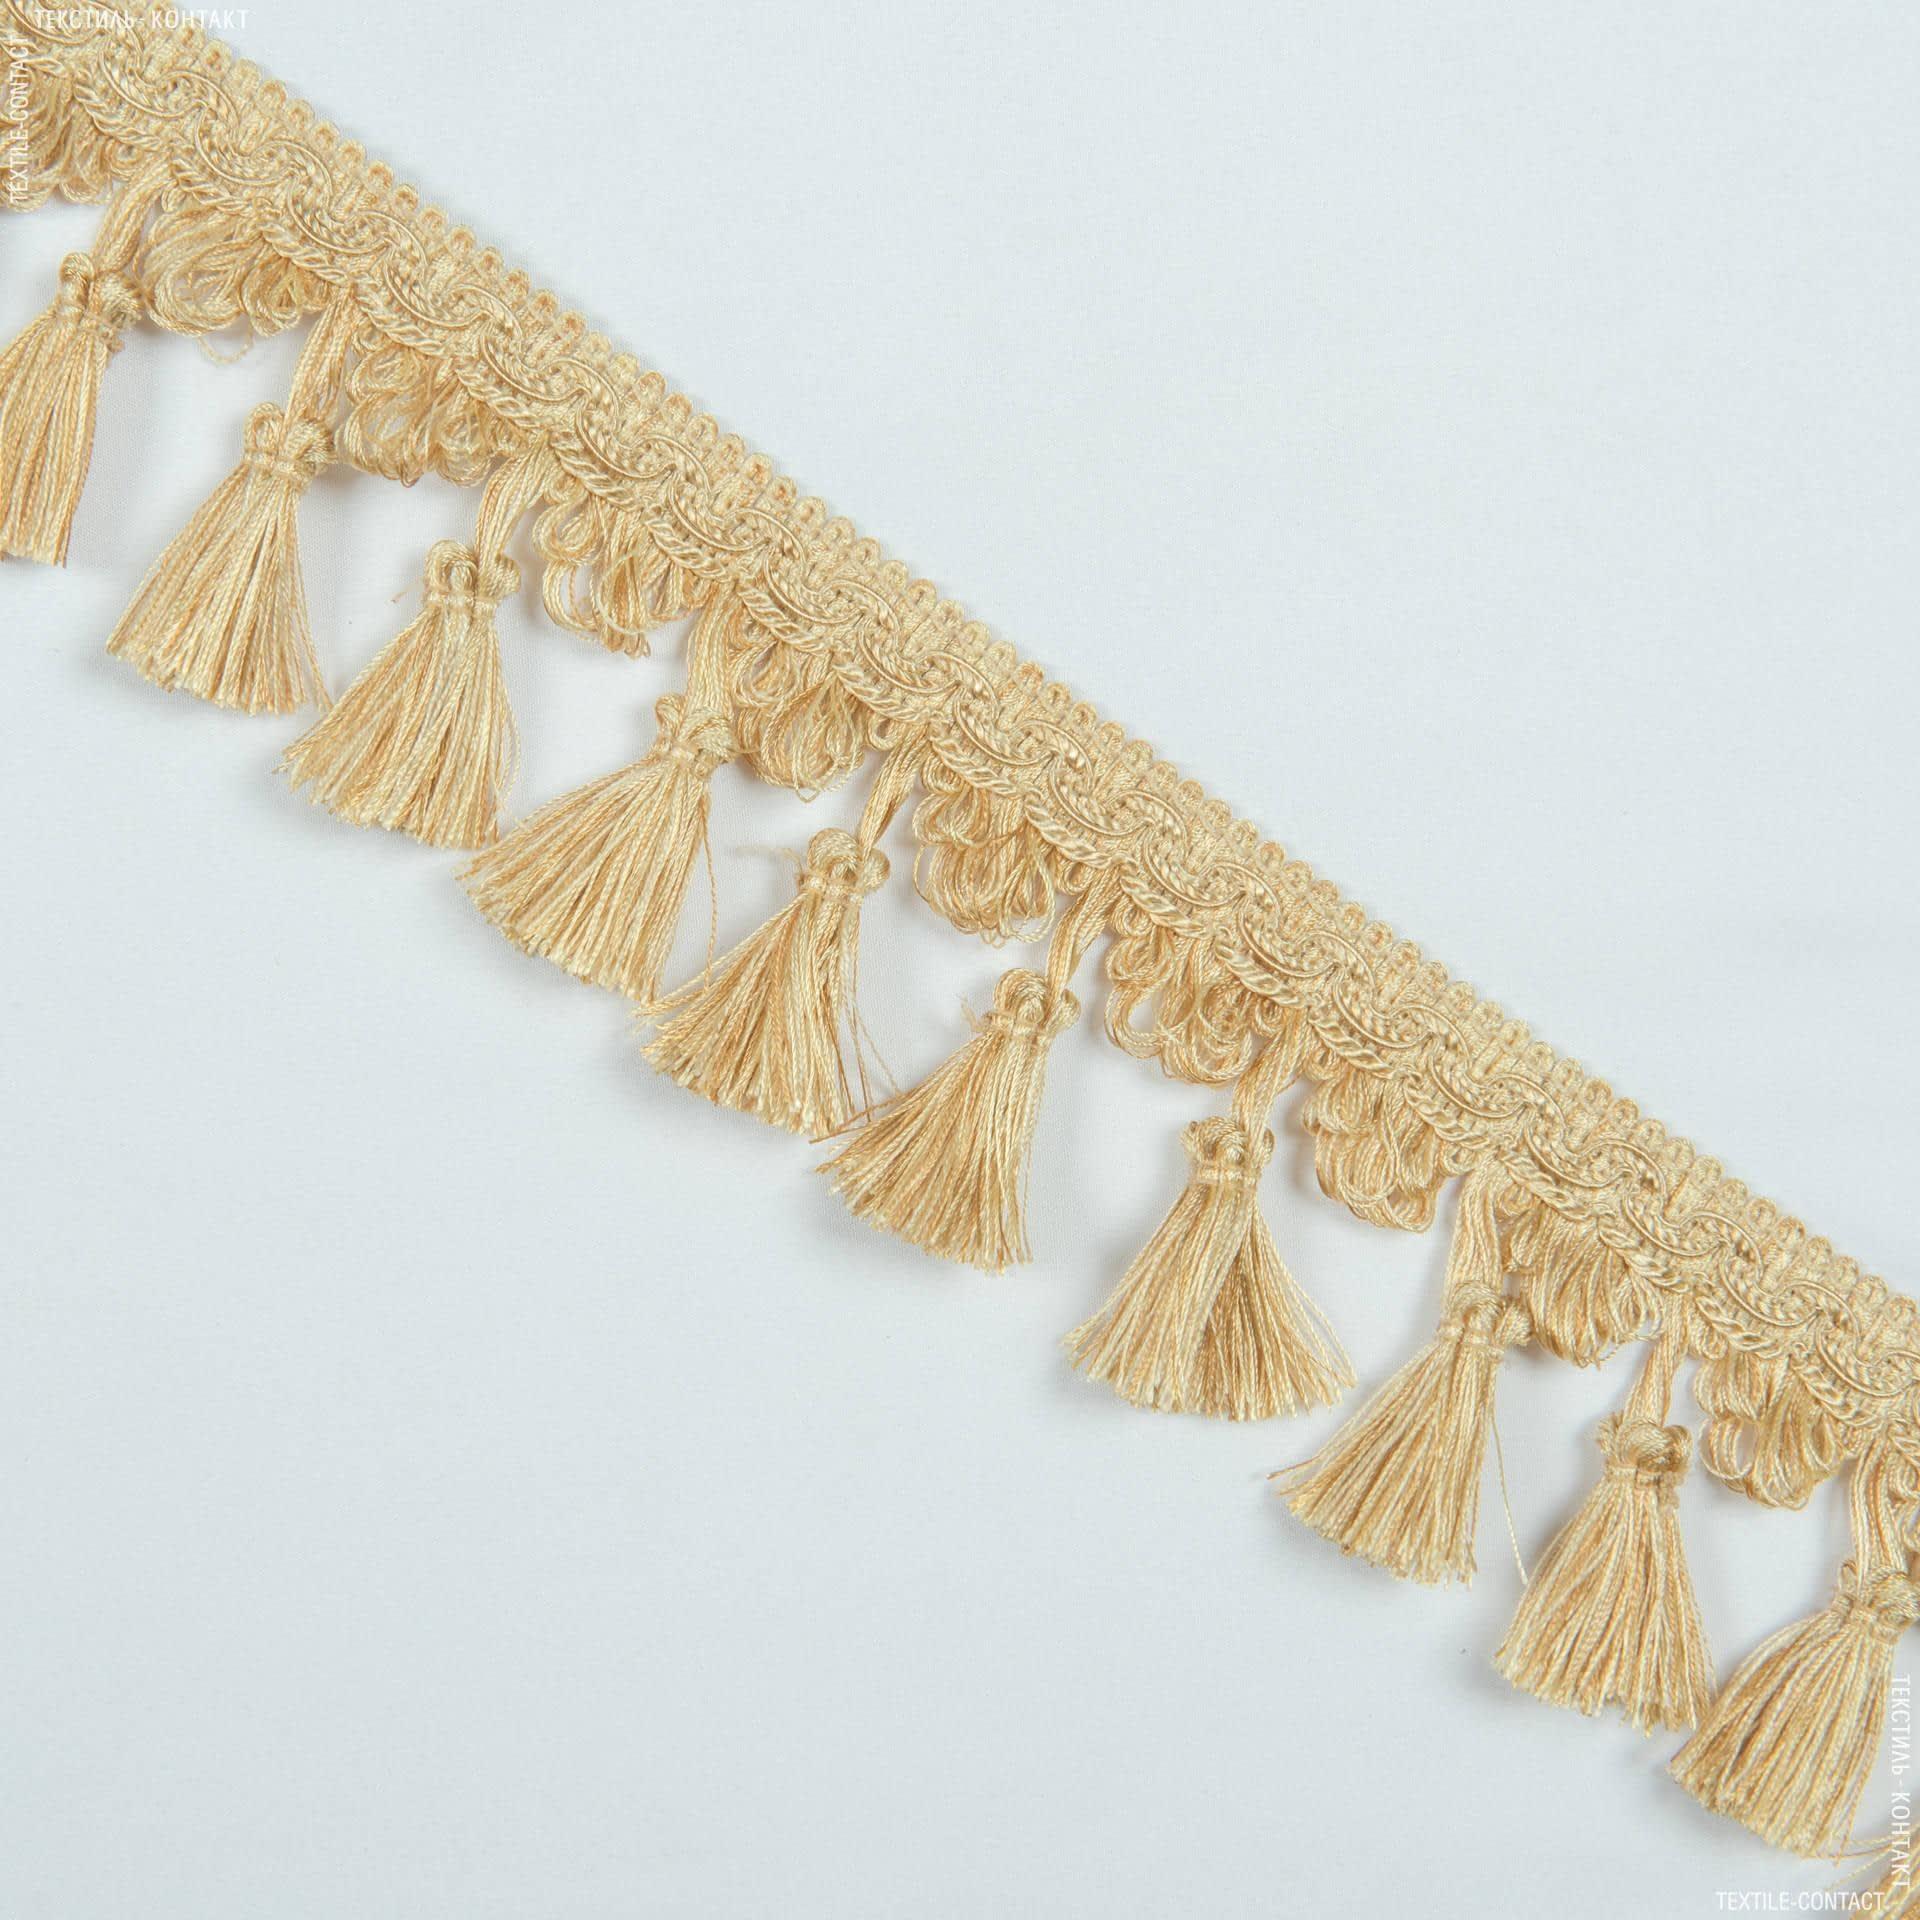 Ткани фурнитура для декора - Бахрома солар кисточка св.золото